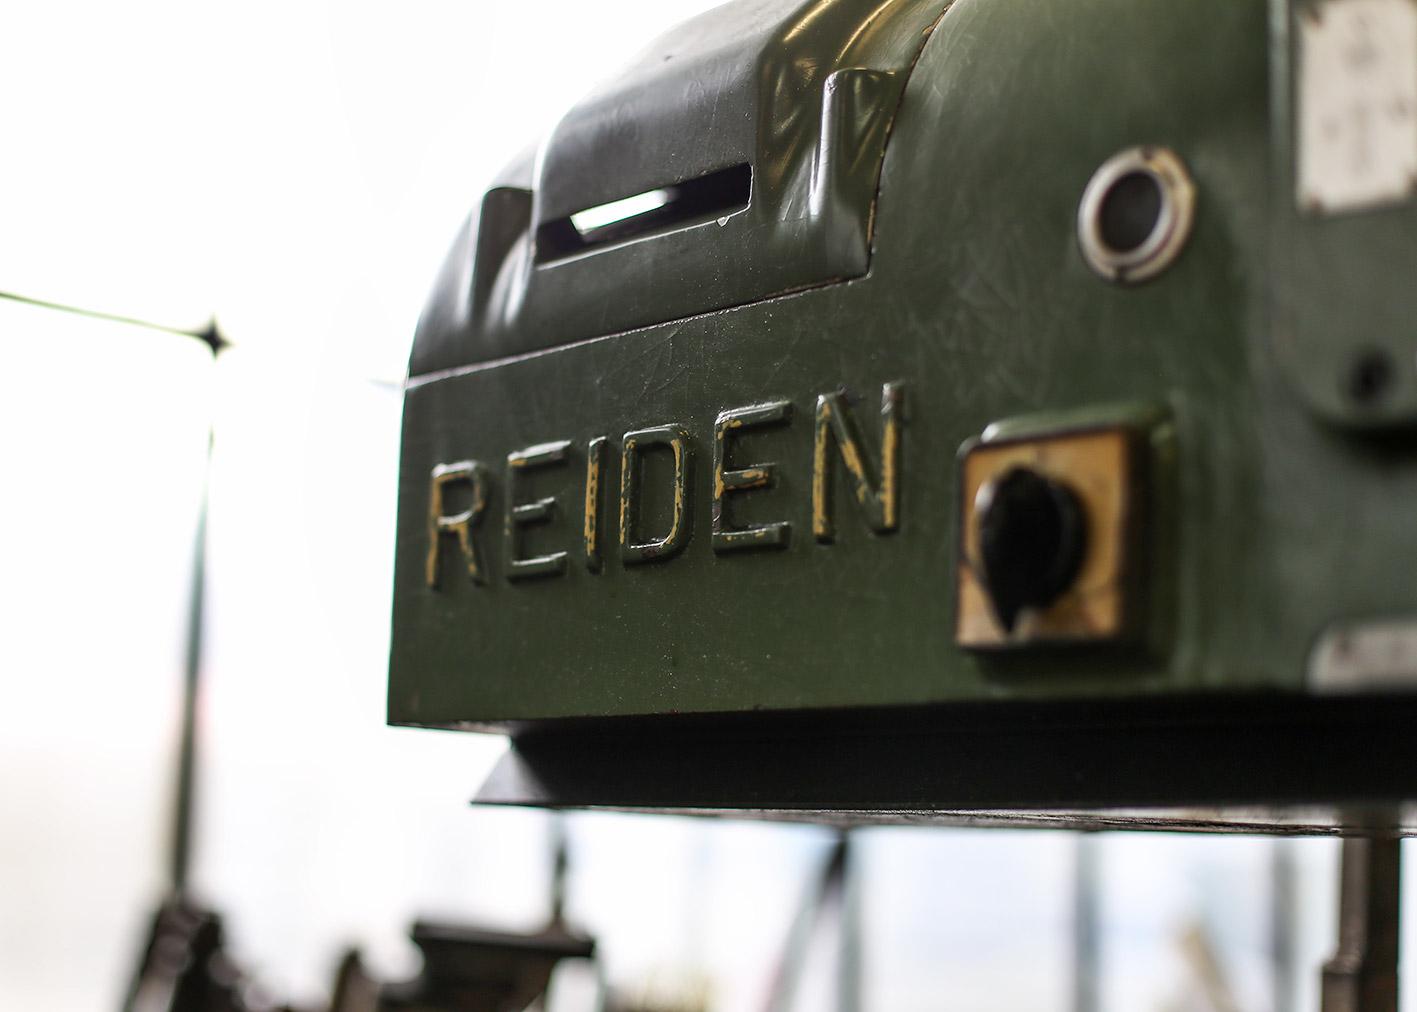 fraisage conventionnel reiden HF300 reco mecanique valais salgesch